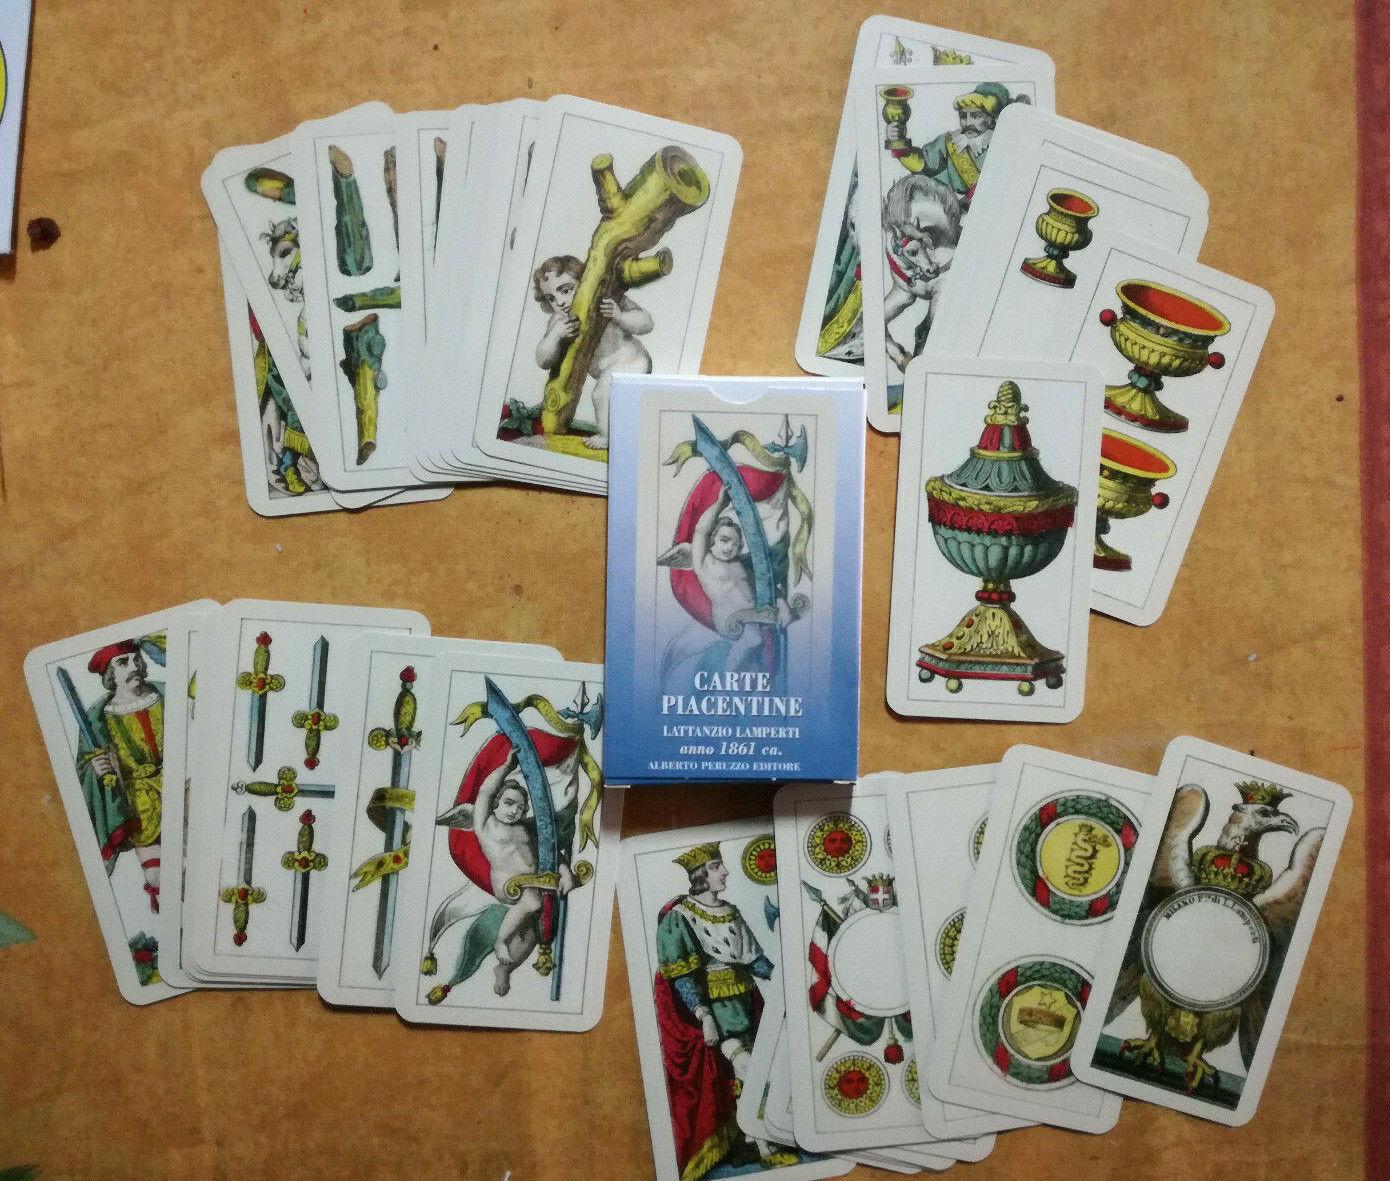 Lattanzio Lamperti CARTE PIACENTINE 40 gioco 1861 Piacenza playing cards reprint